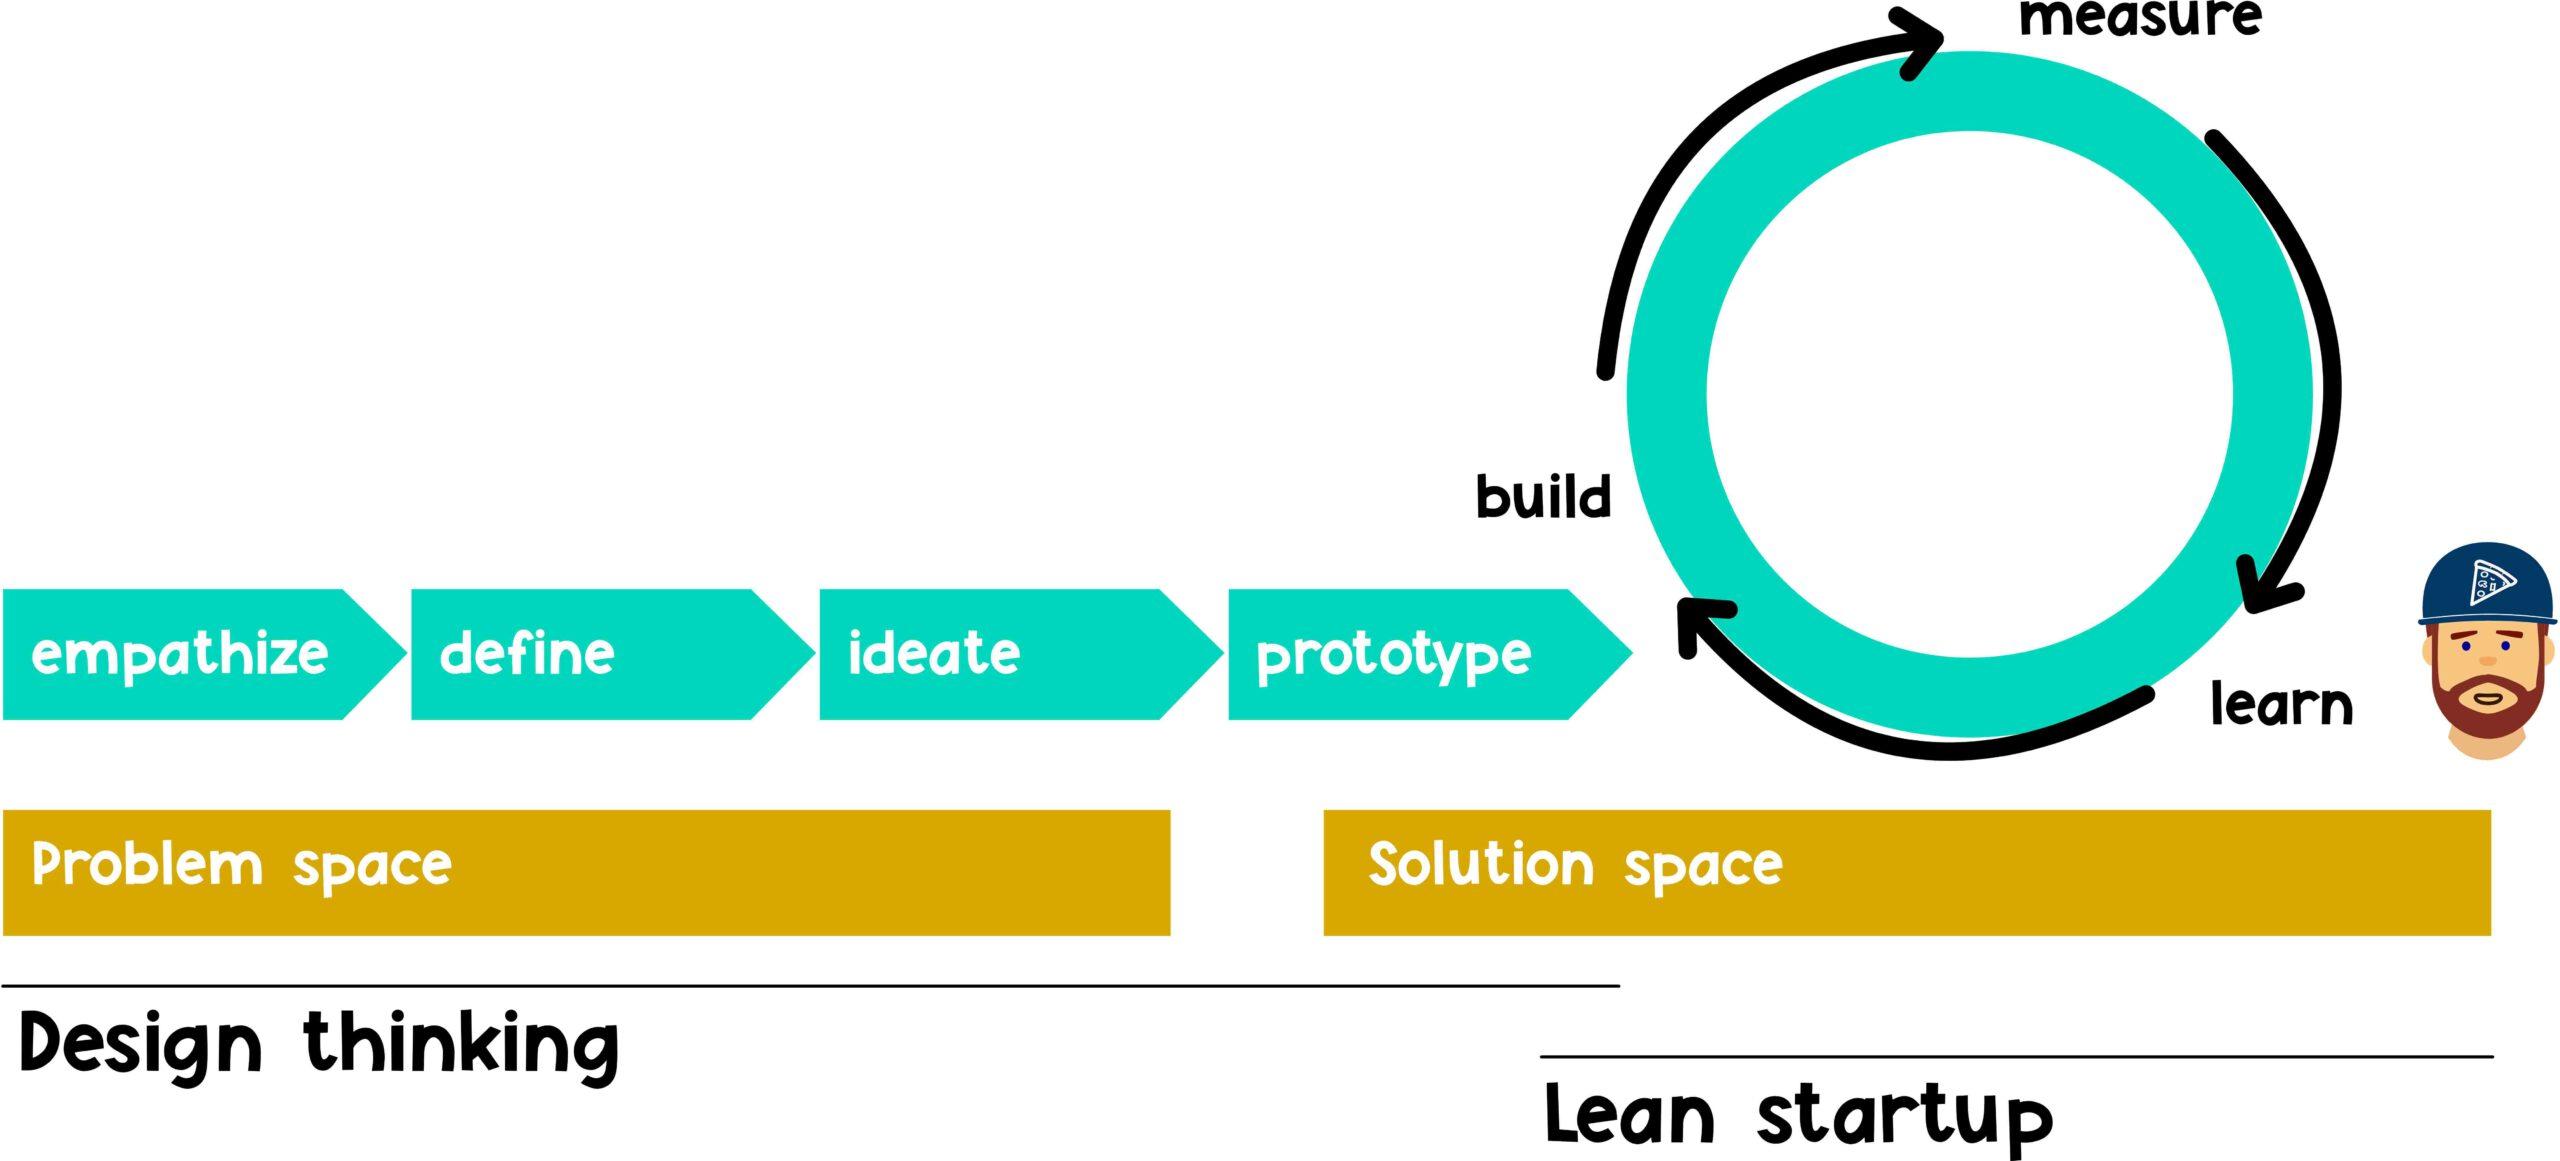 build measure learn